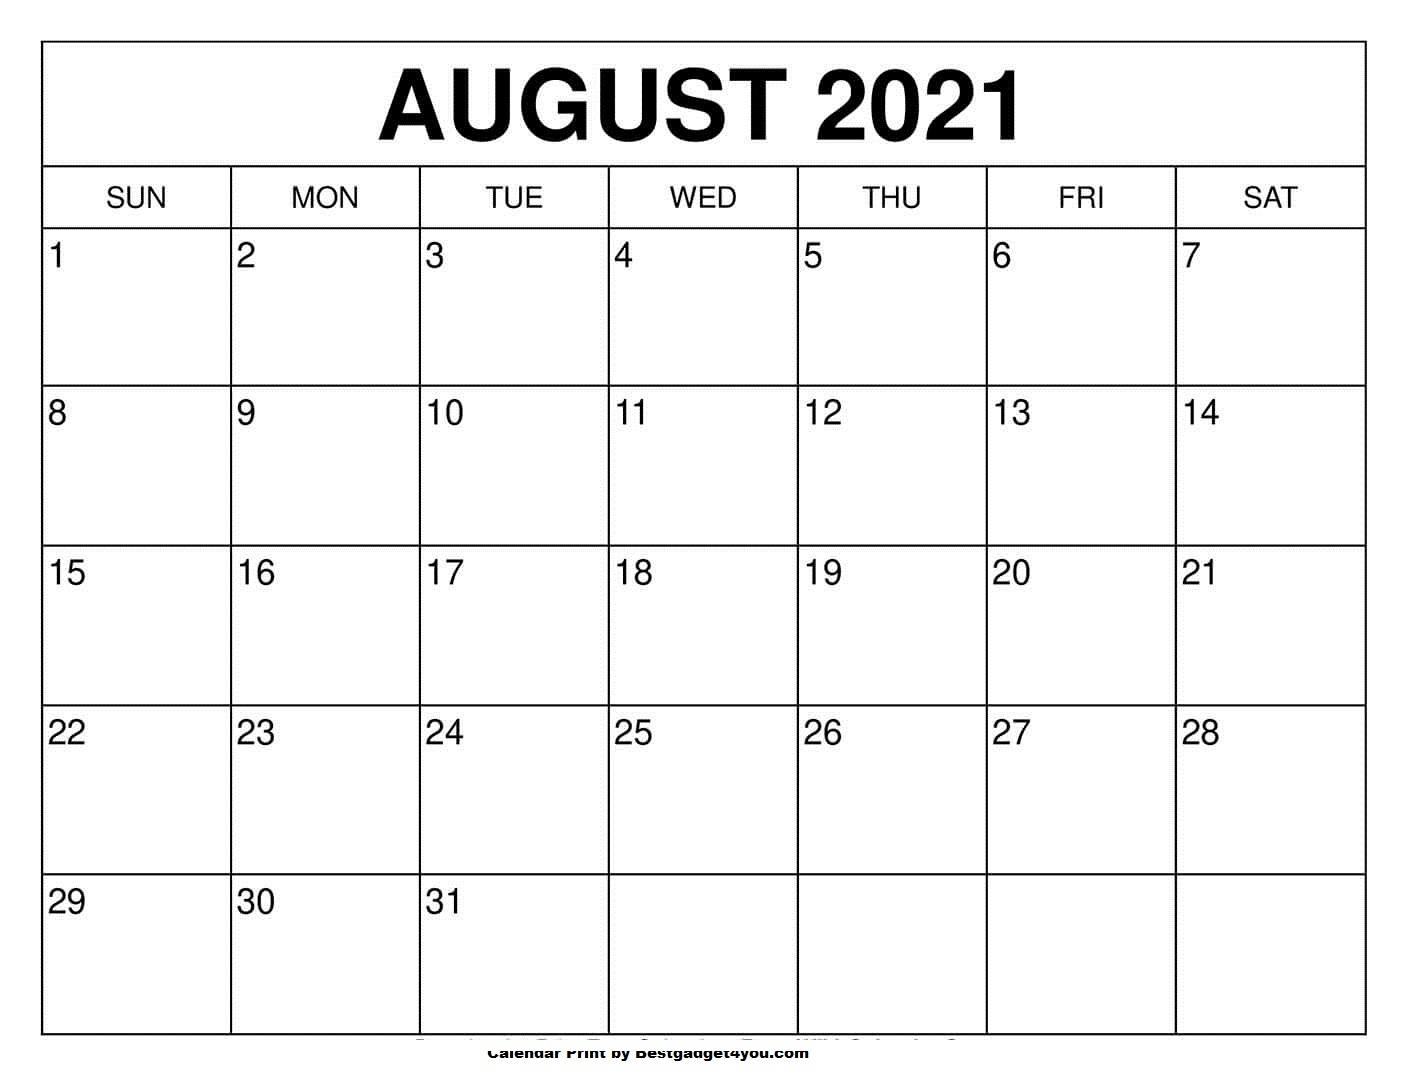 Printable August 2021 Calendar - Bestgadget4You